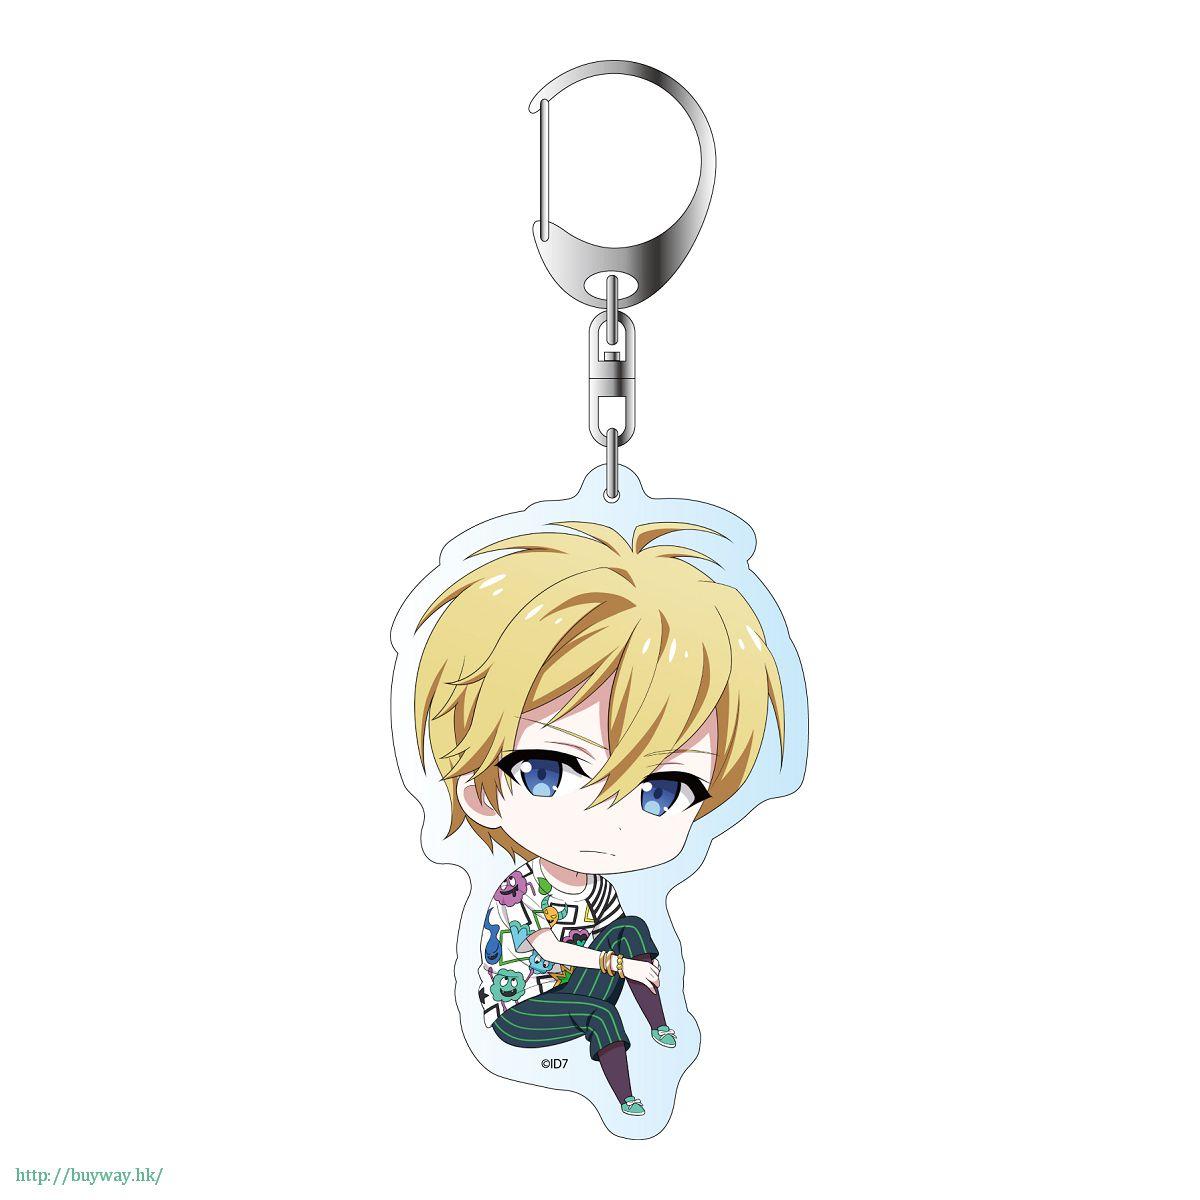 IDOLiSH7 「六弥ナギ」Monster Parade 亞克力匙扣 Monster Parade Acrylic Key Chain Rokuya Nagi【IDOLiSH7】